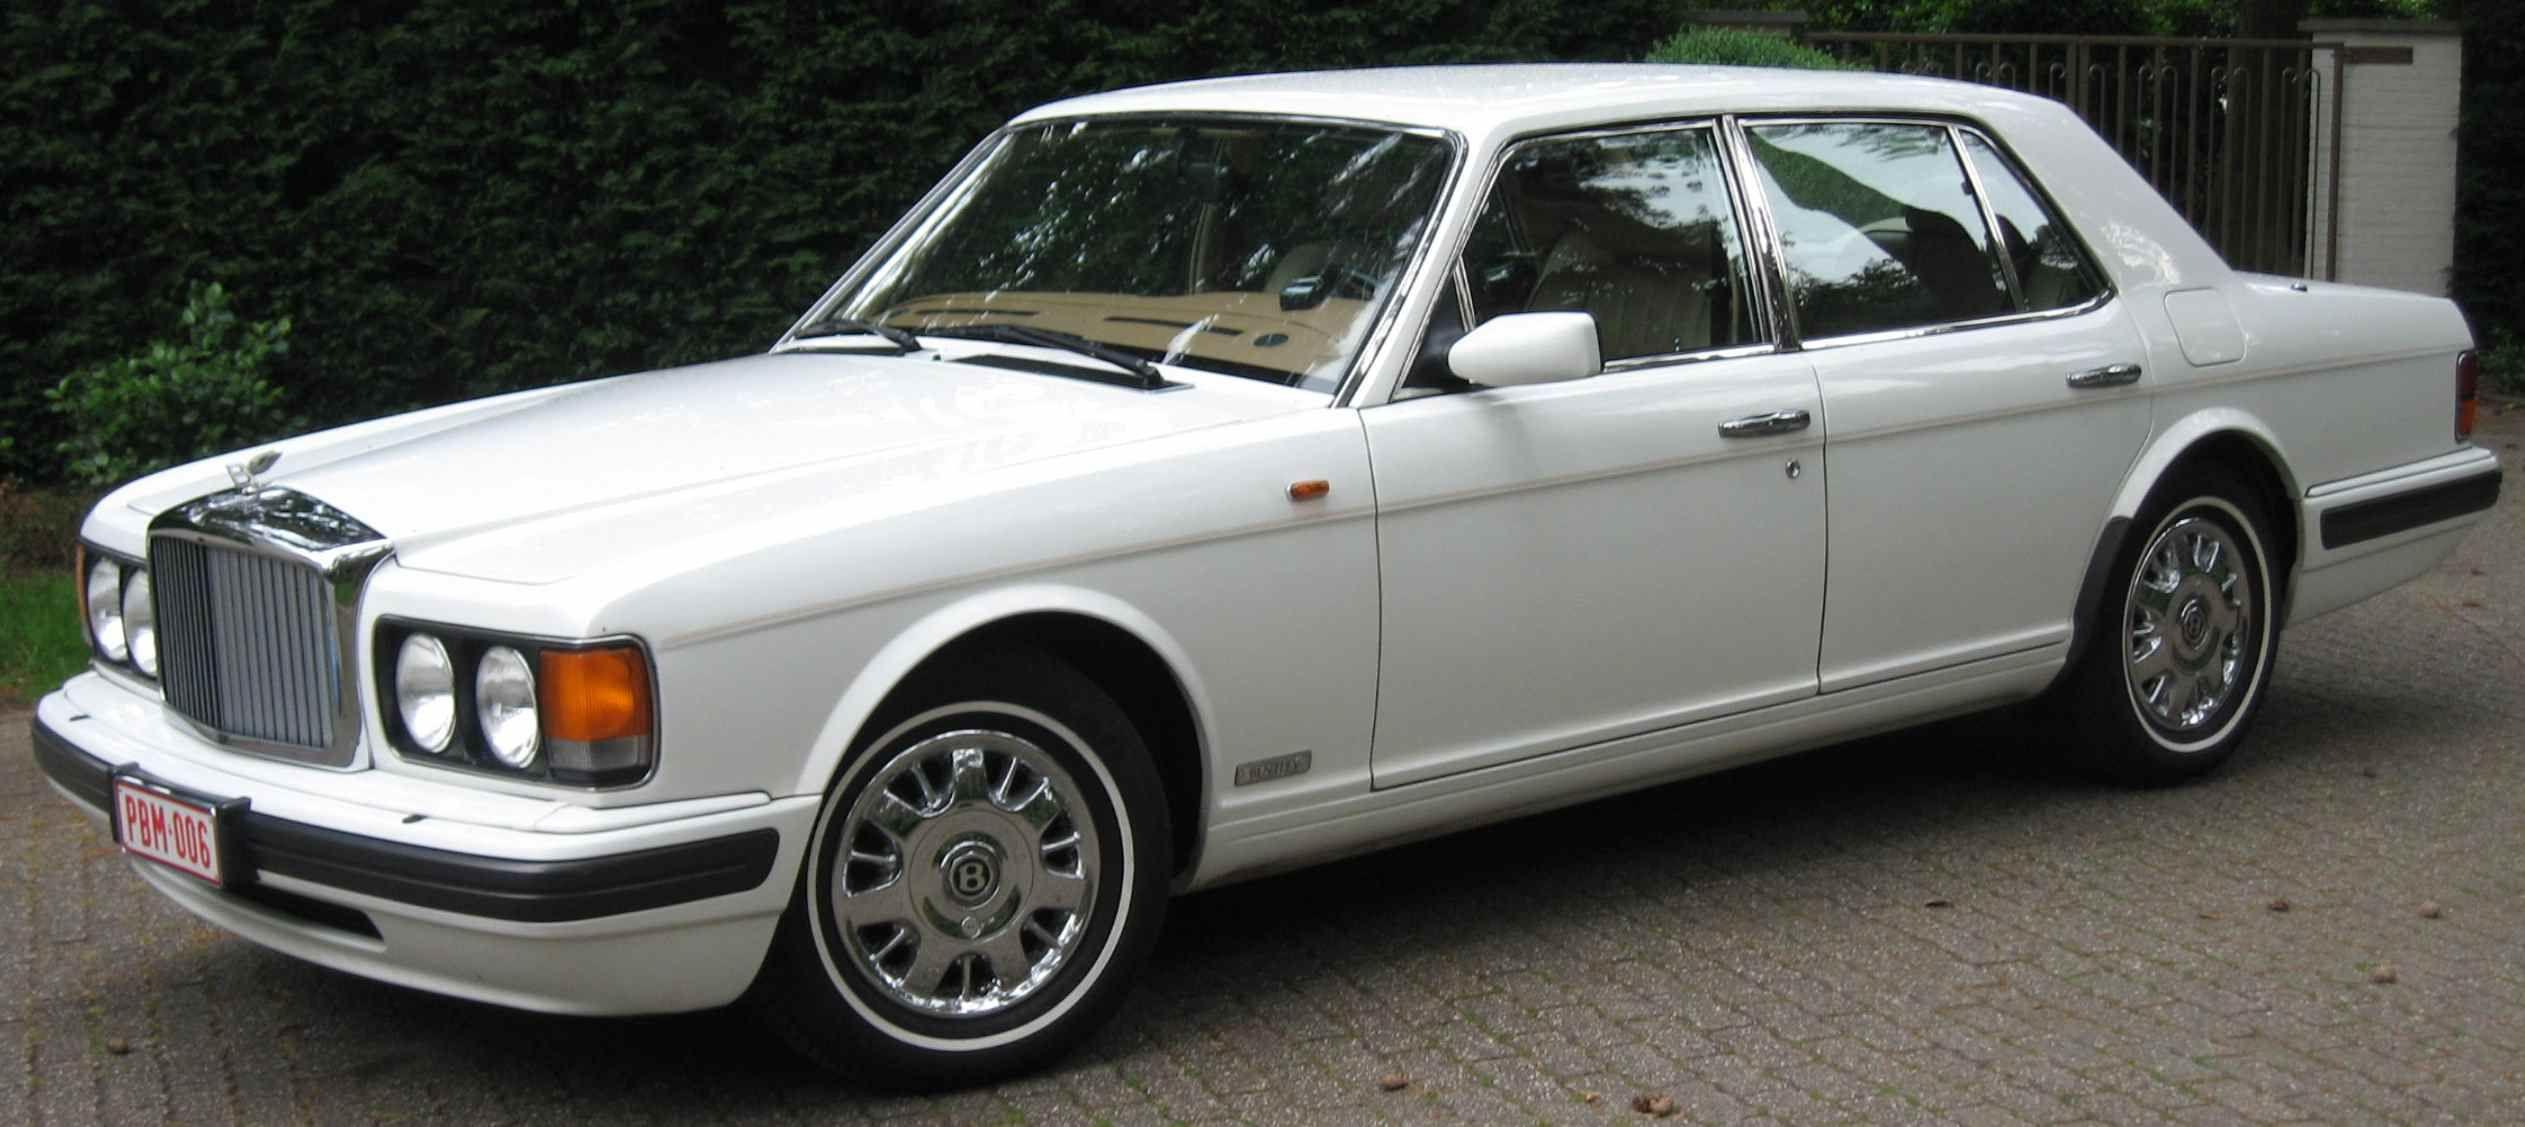 Bentley Brooklands Exclusive Luxury Car | dream car ...